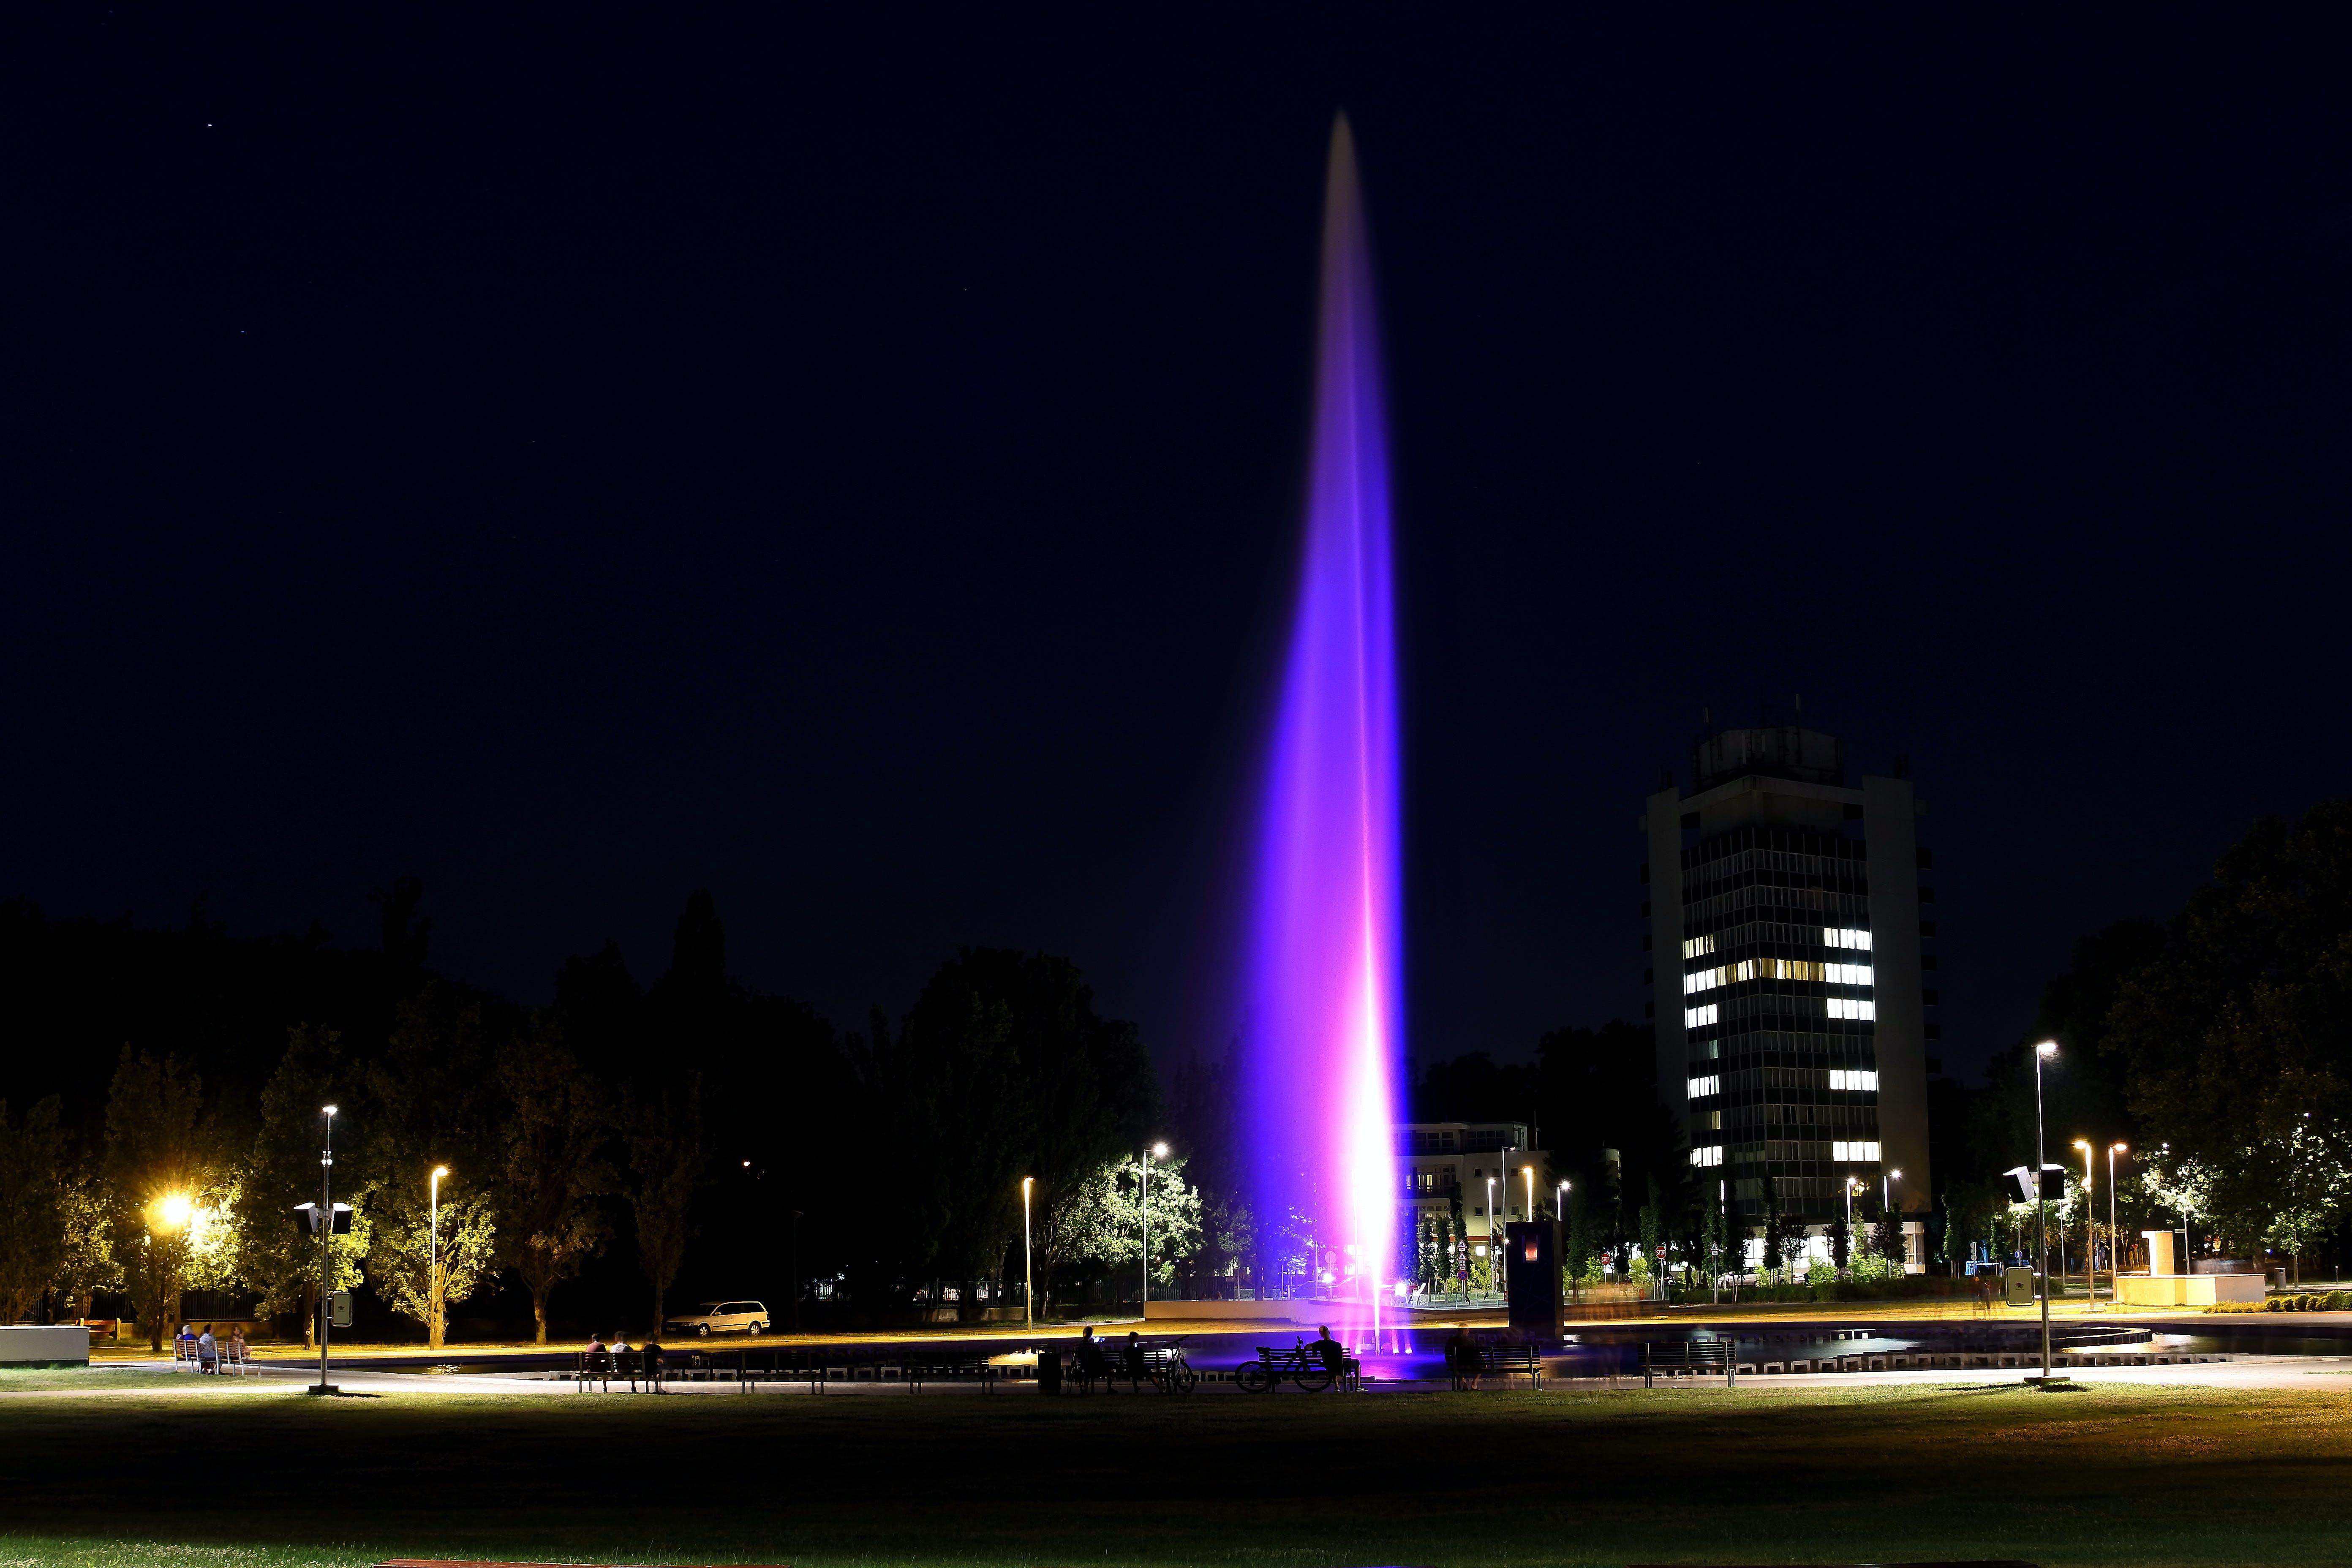 Fountain With Purple Lights